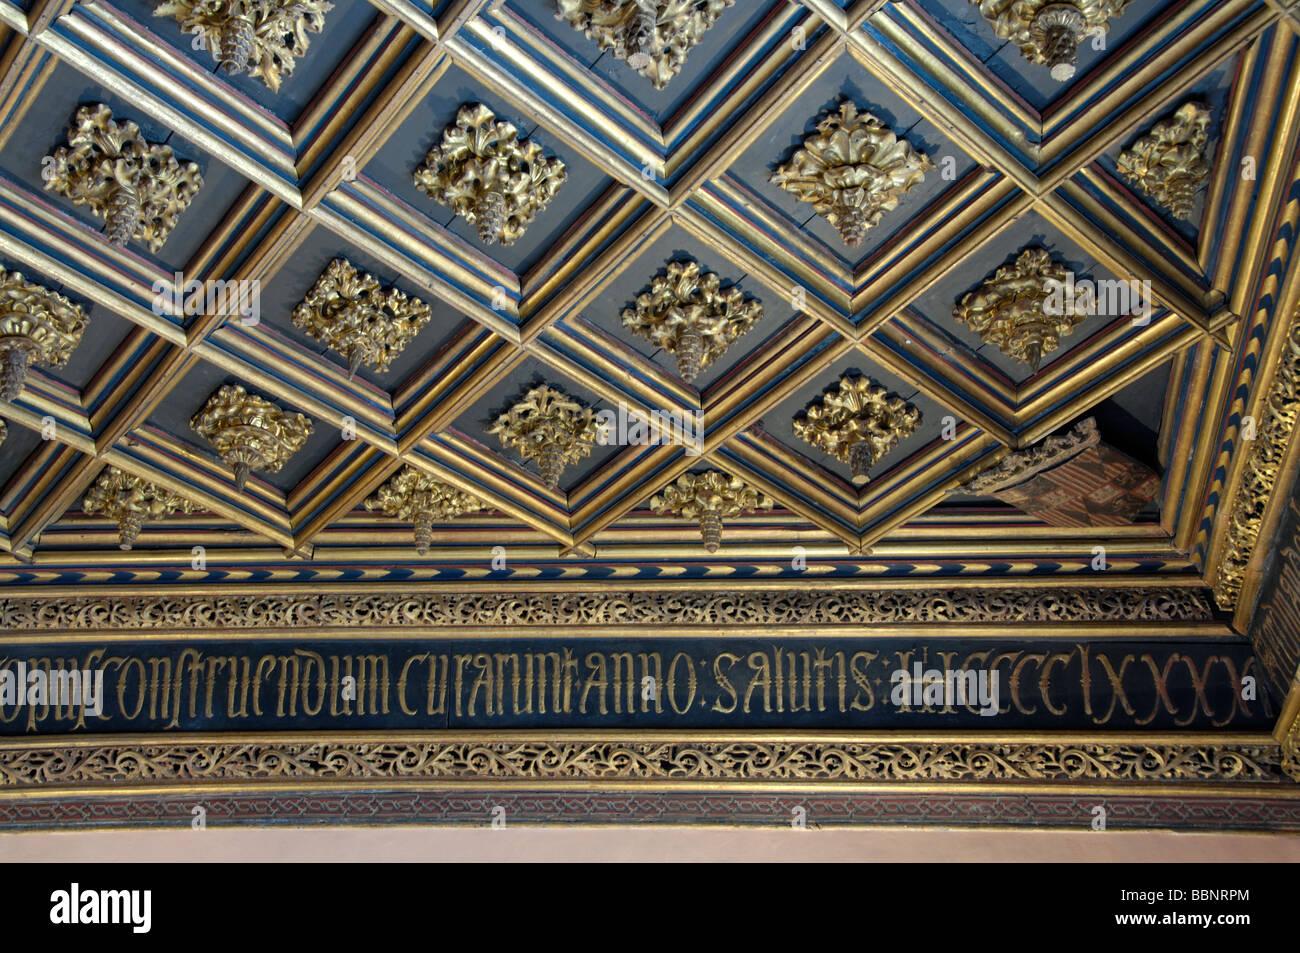 Aljaferia's Palace in Zaragoza.The Palace of Catholic Monarches of Spain. - Stock Image